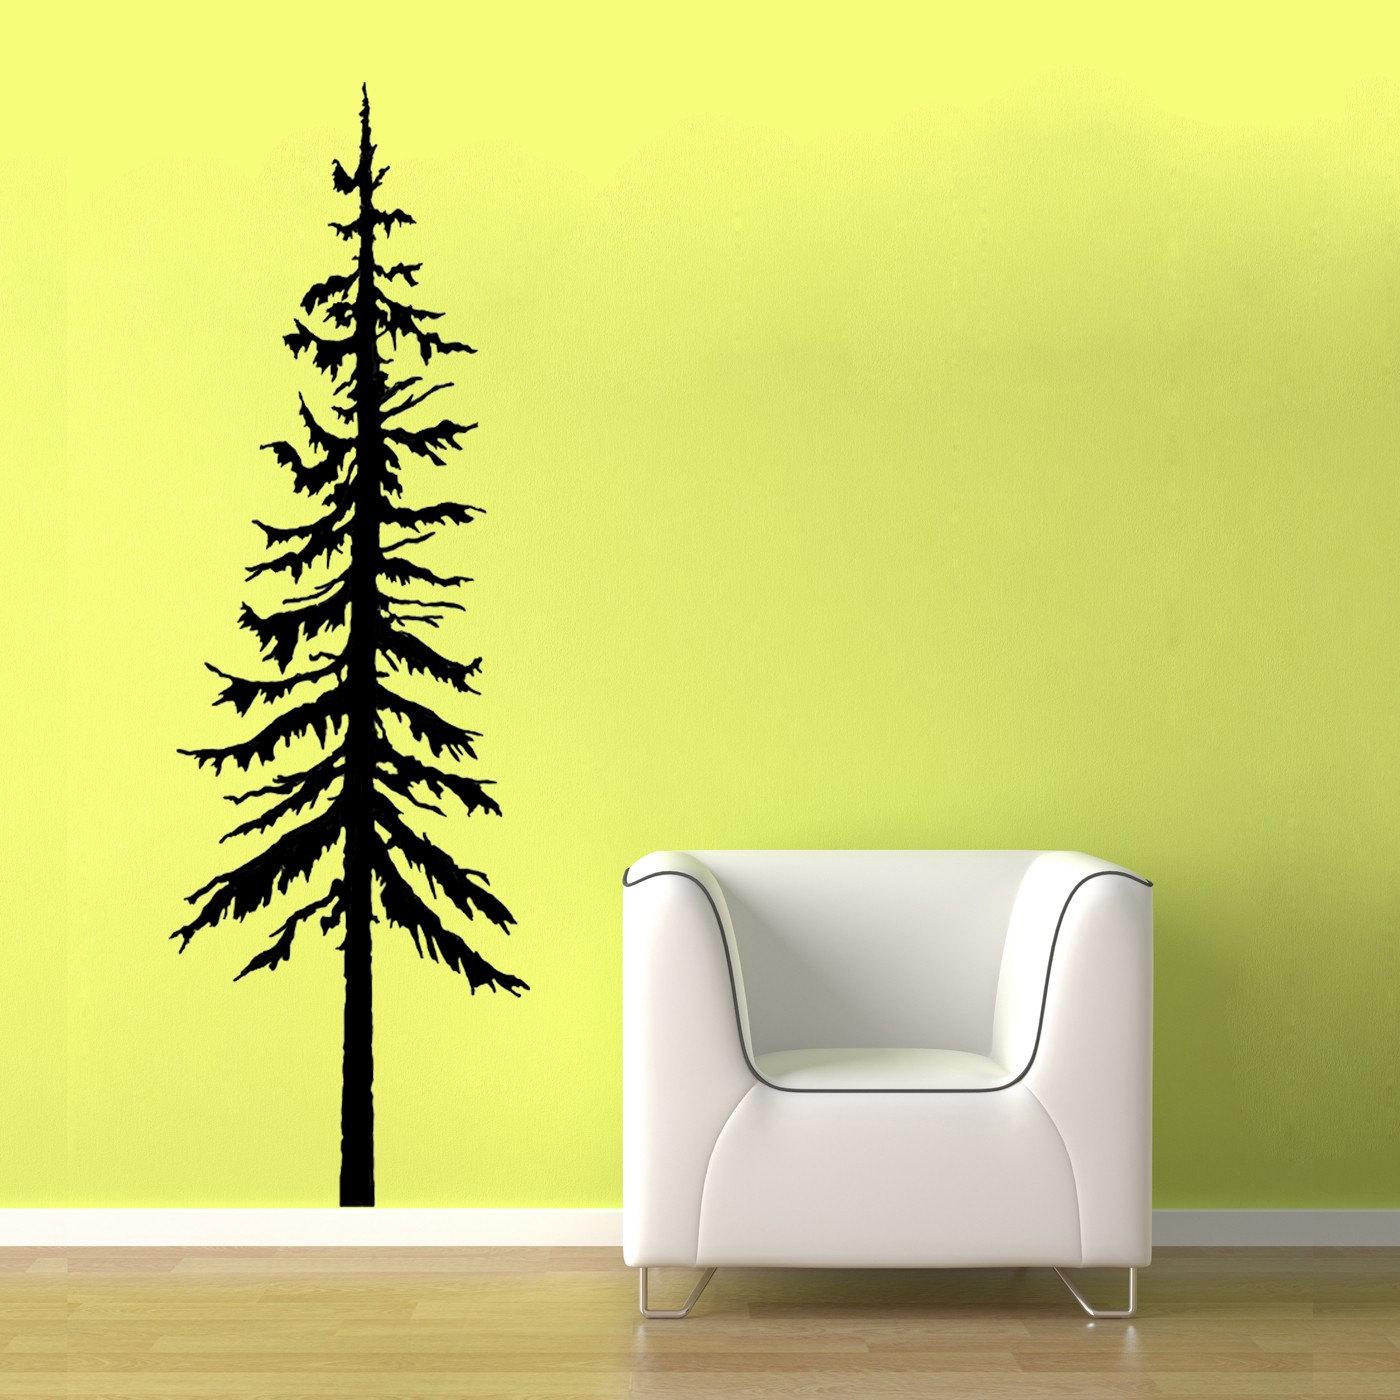 Pine Tree Decal vinyl wall graphic Pine Tree Decal Pine